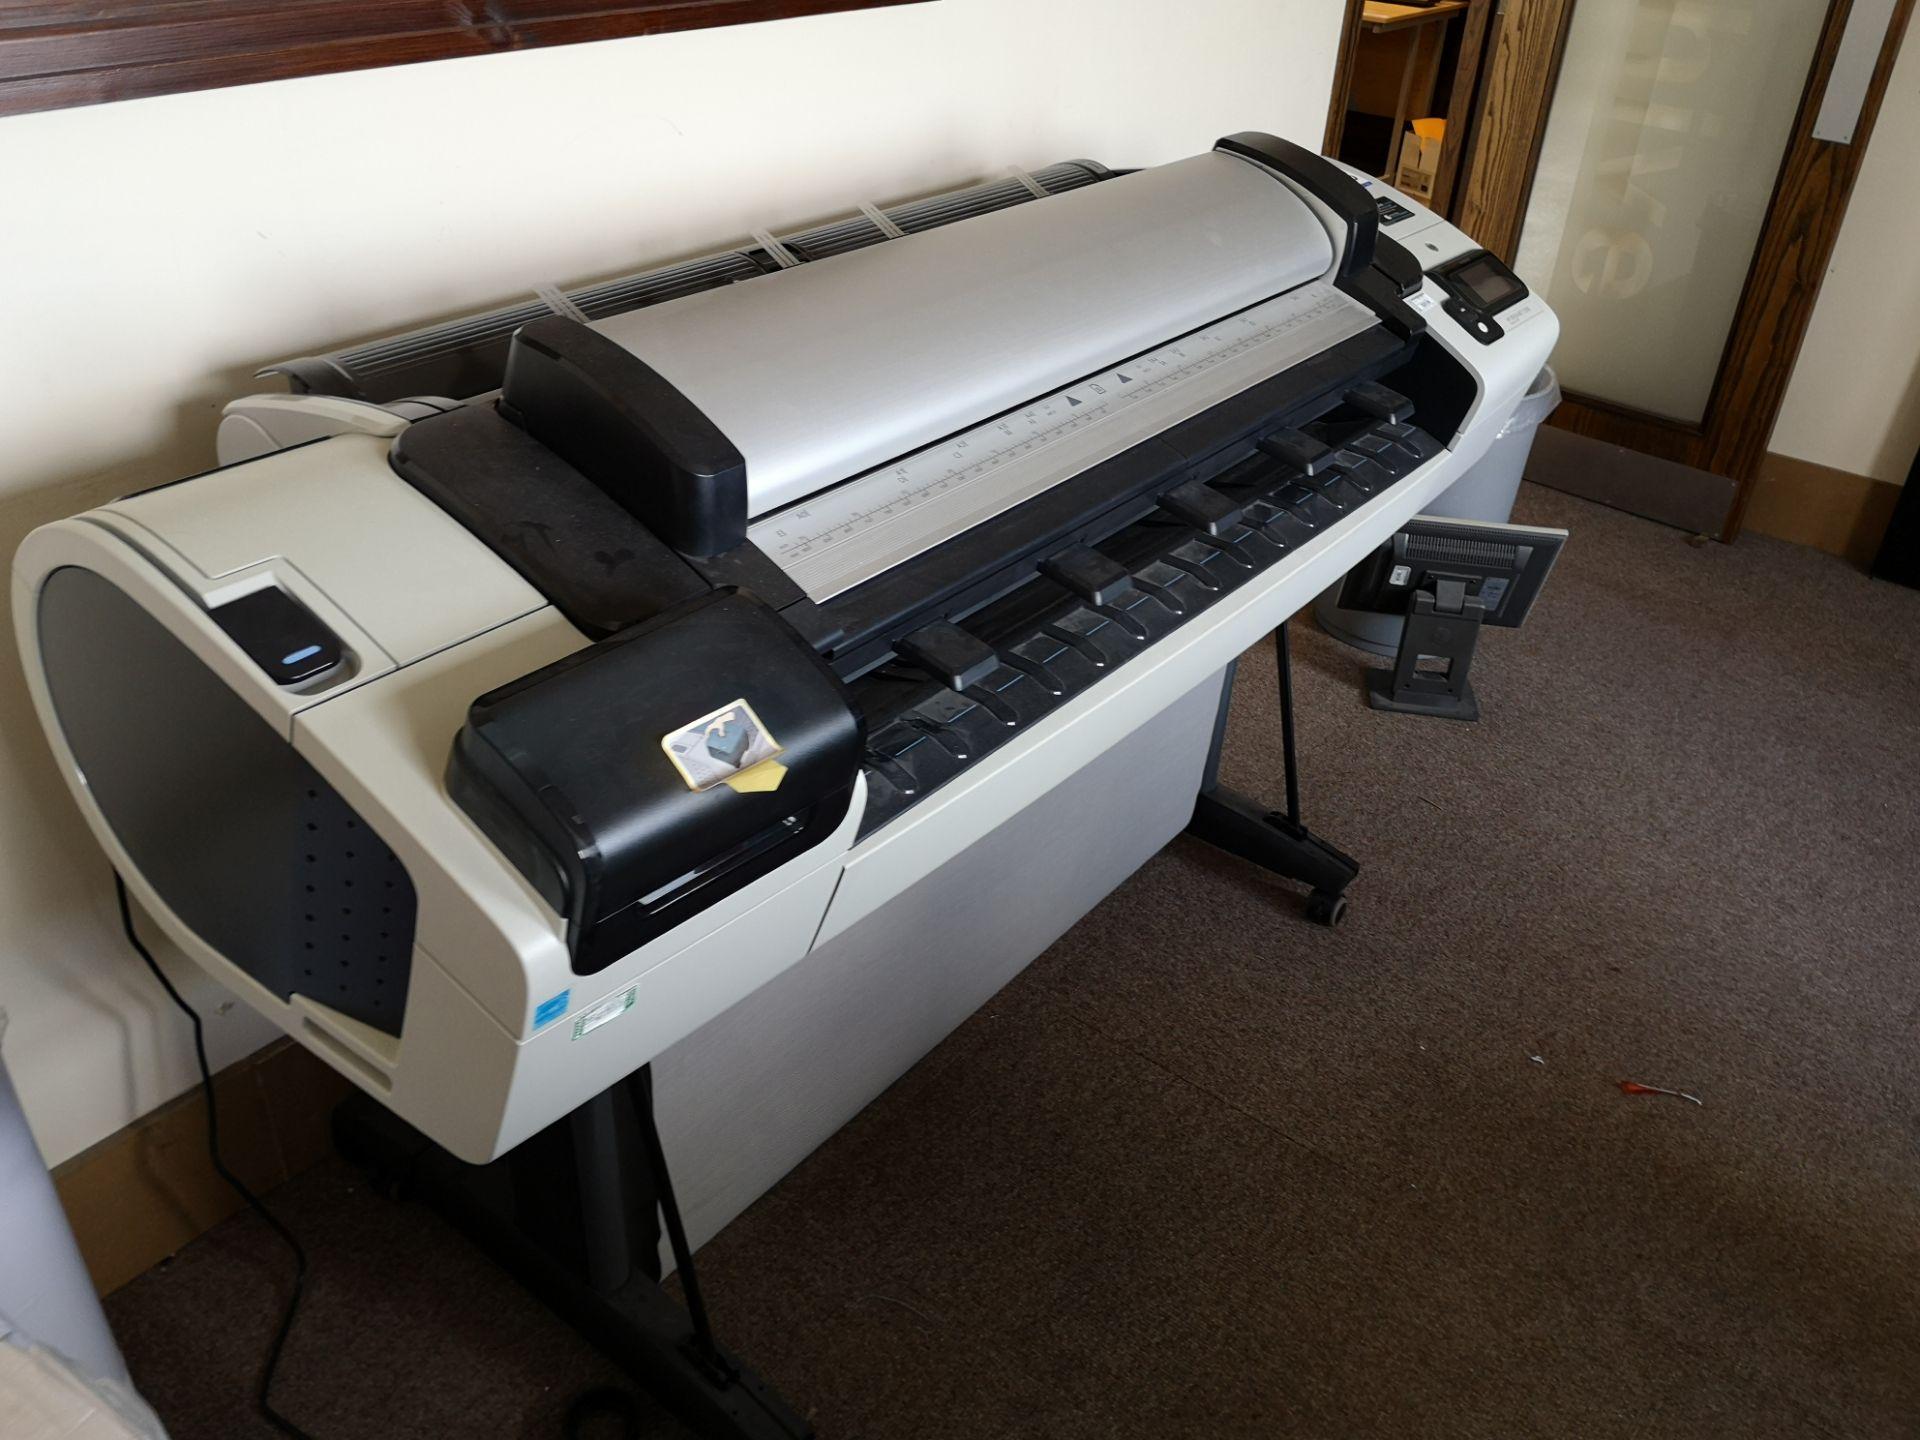 Lot 628 - HP DesignJet T2300 Post Script eMFP Plan Printer (